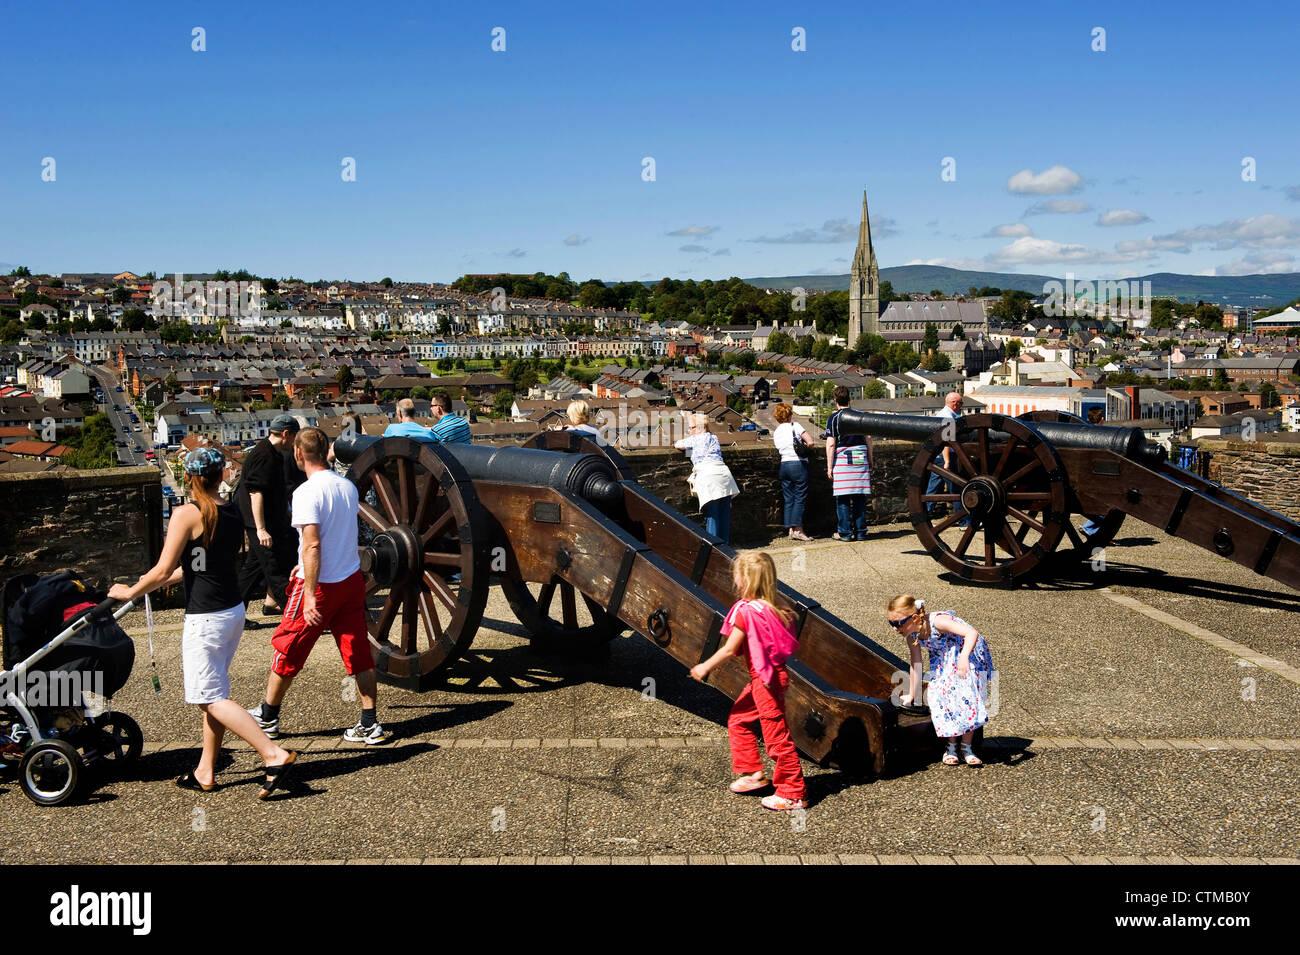 Derry's Walls, Northern Ireland - Stock Image